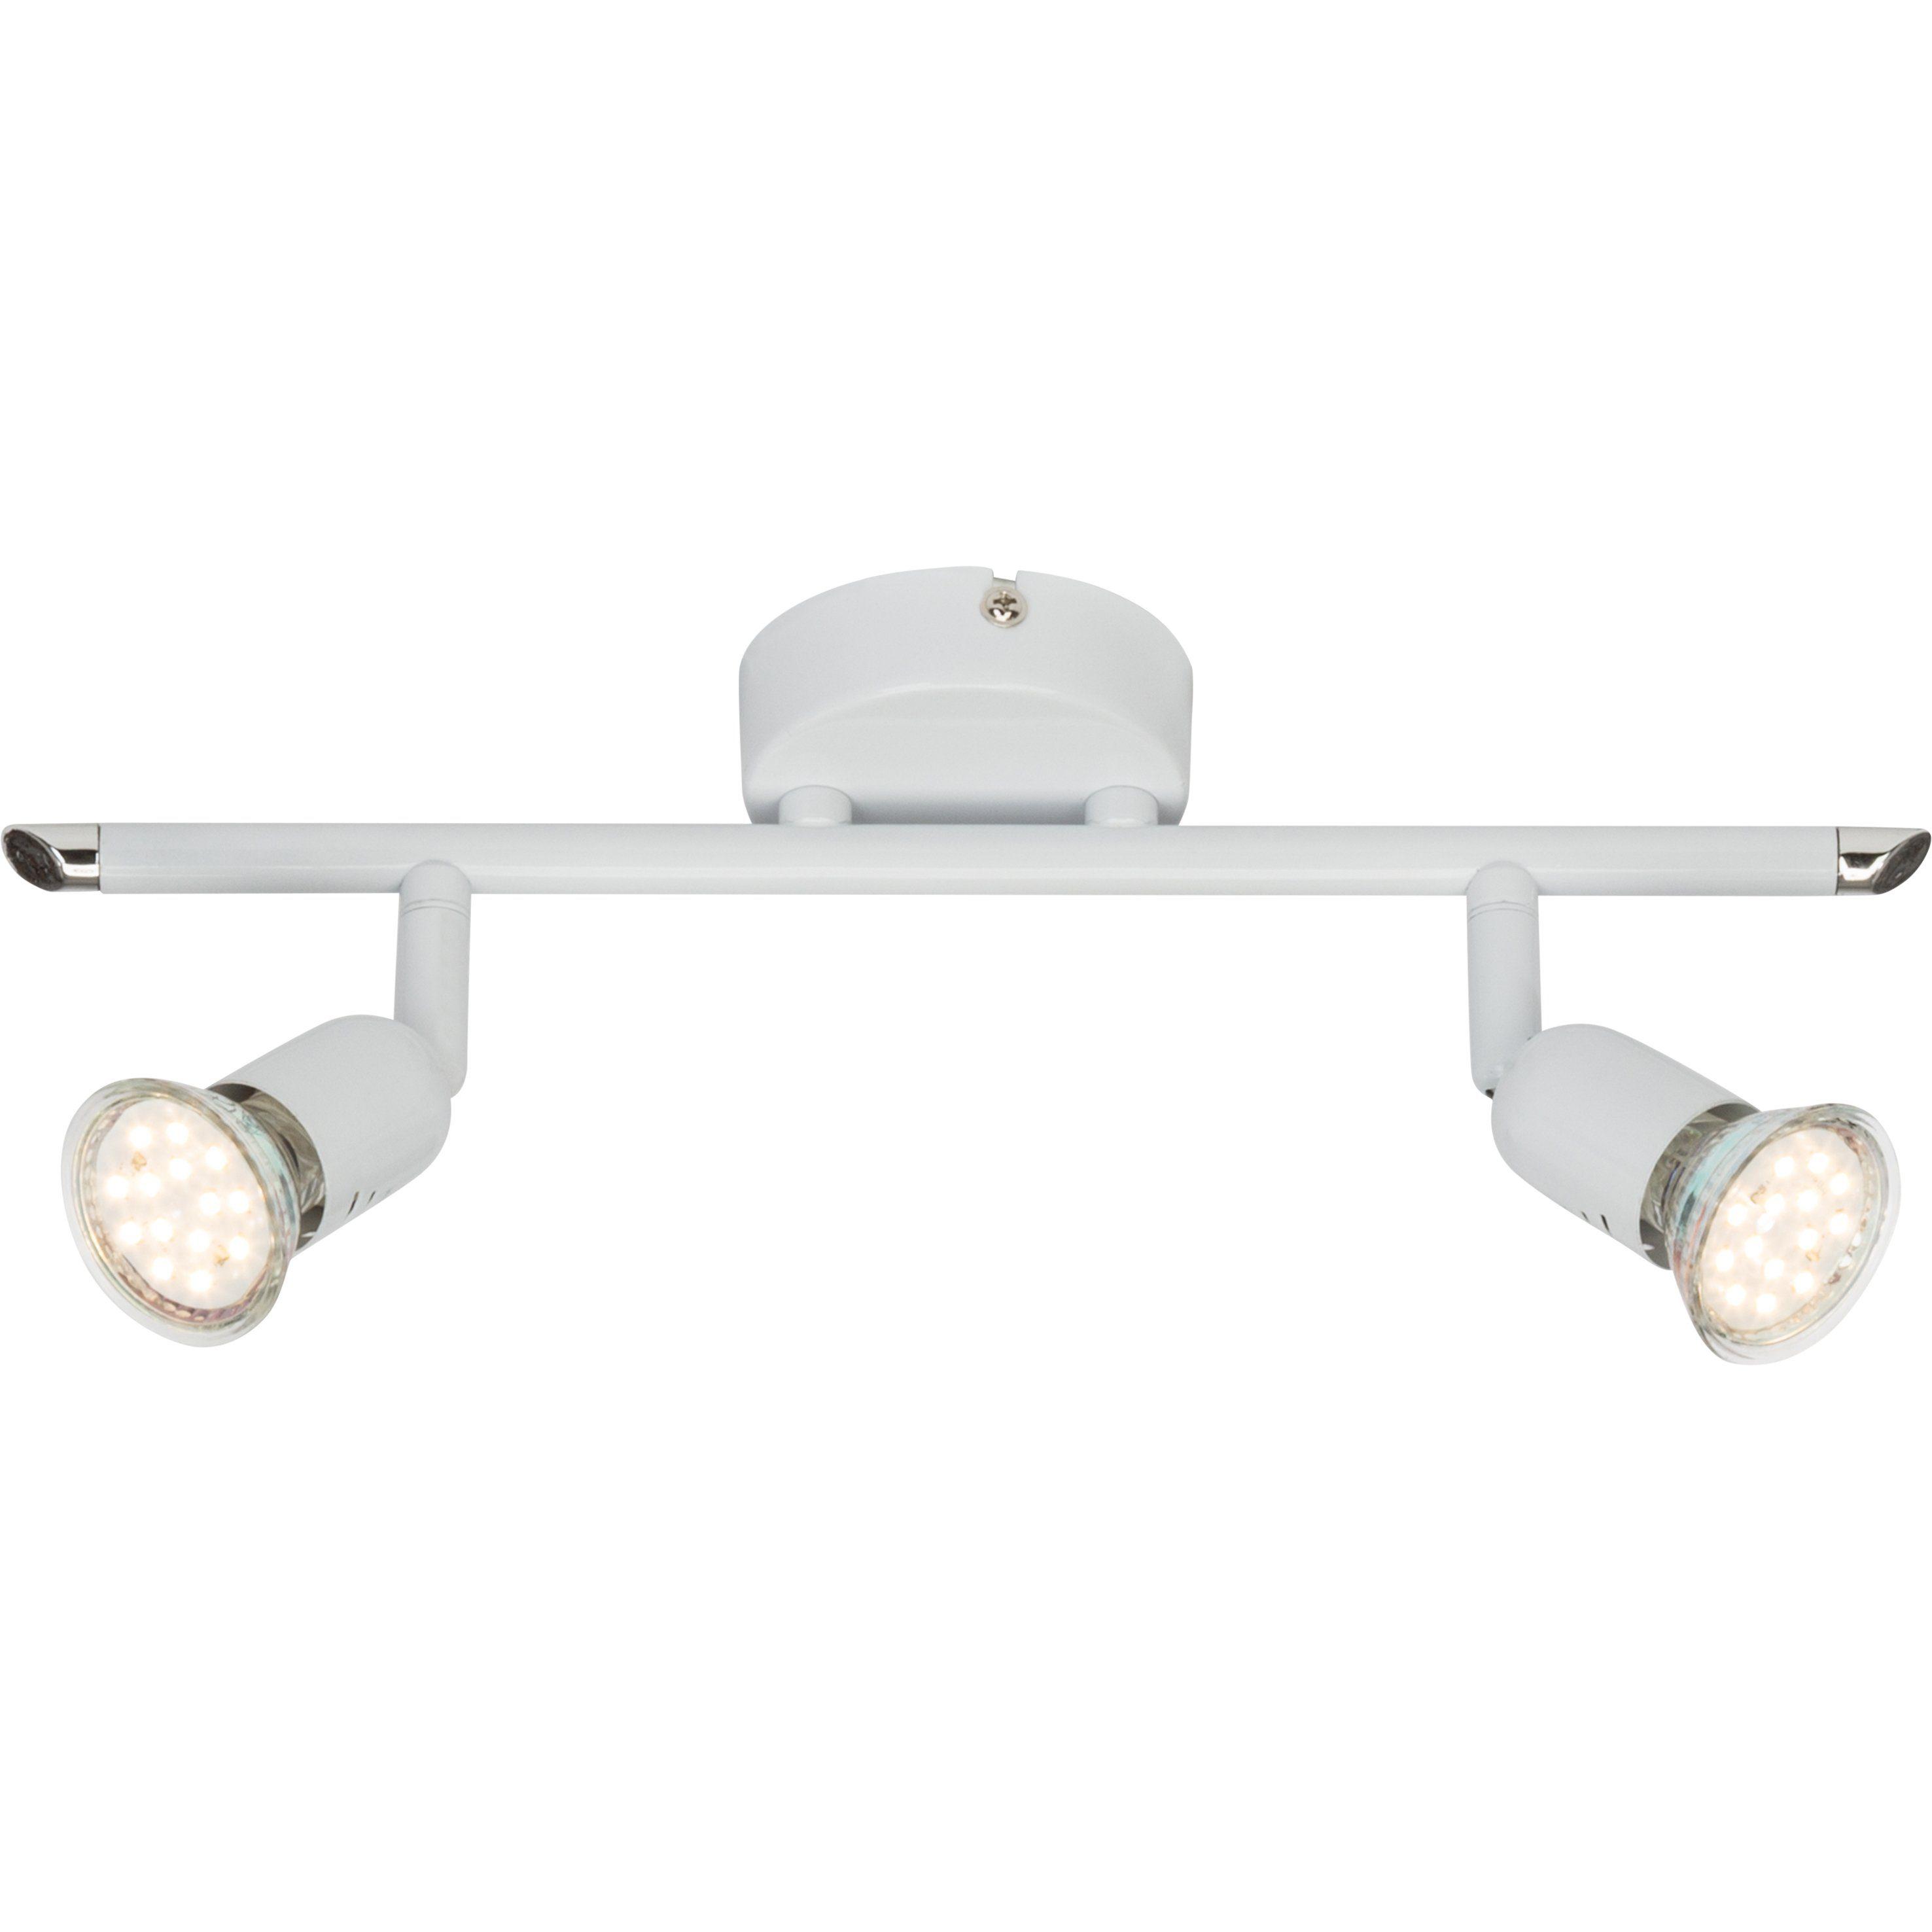 Brilliant Leuchten Loona LED Spotrohr, 2-flammig weiß